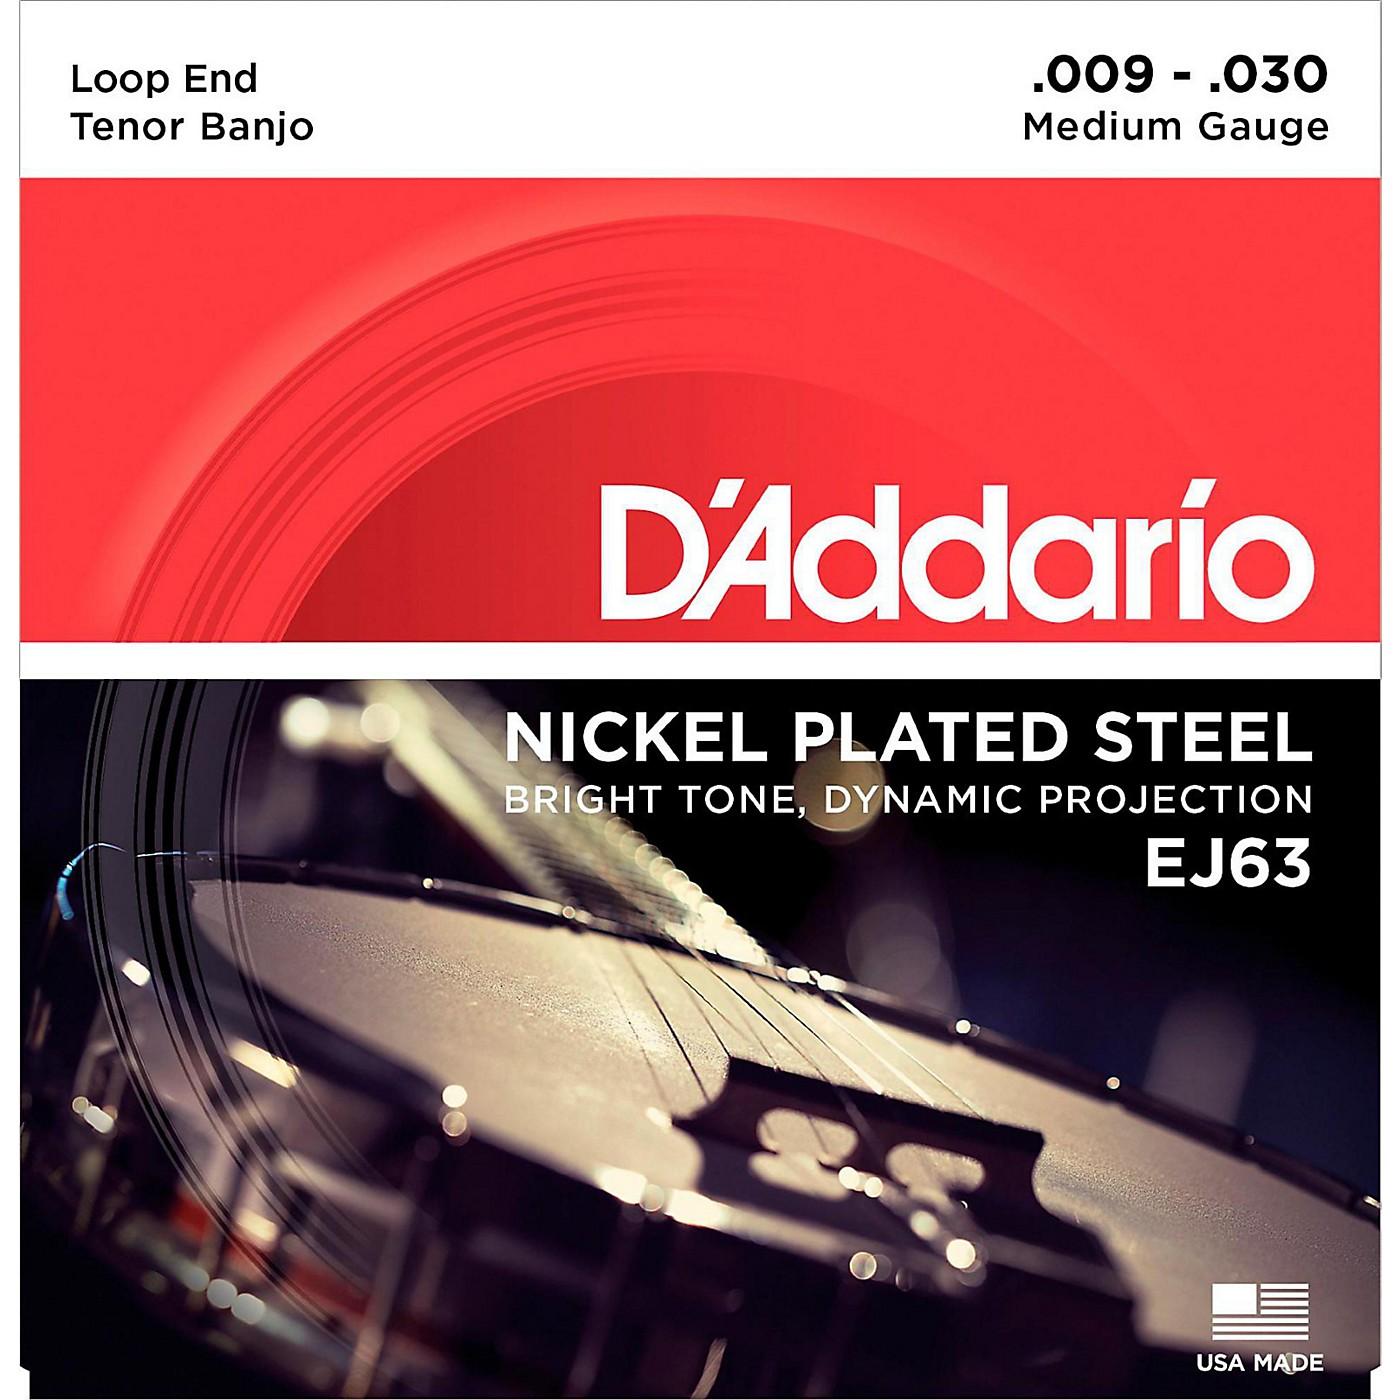 D'Addario EJ63 Nickel Tenor Banjo Strings (9-30) thumbnail